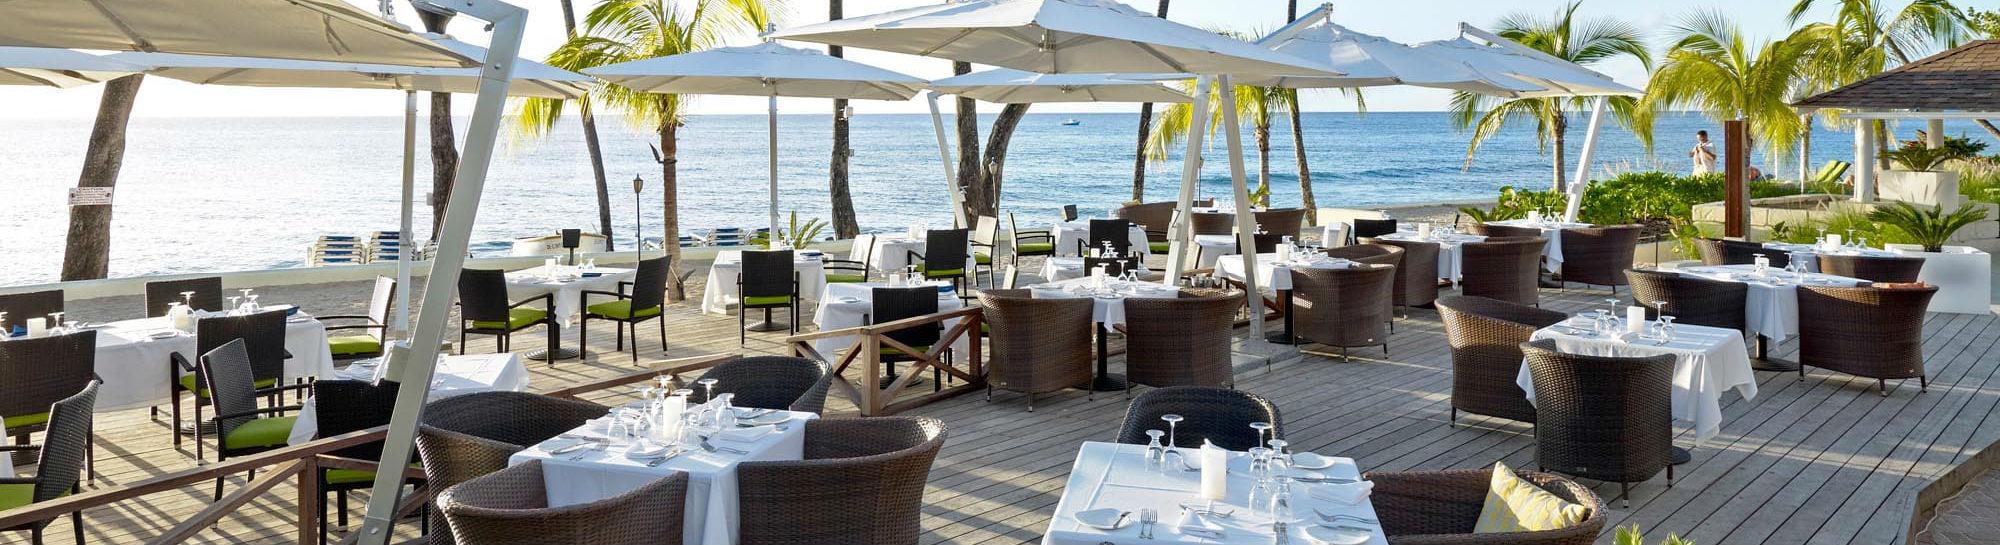 246 restaurant at the Tamarind by Elegant Hotels